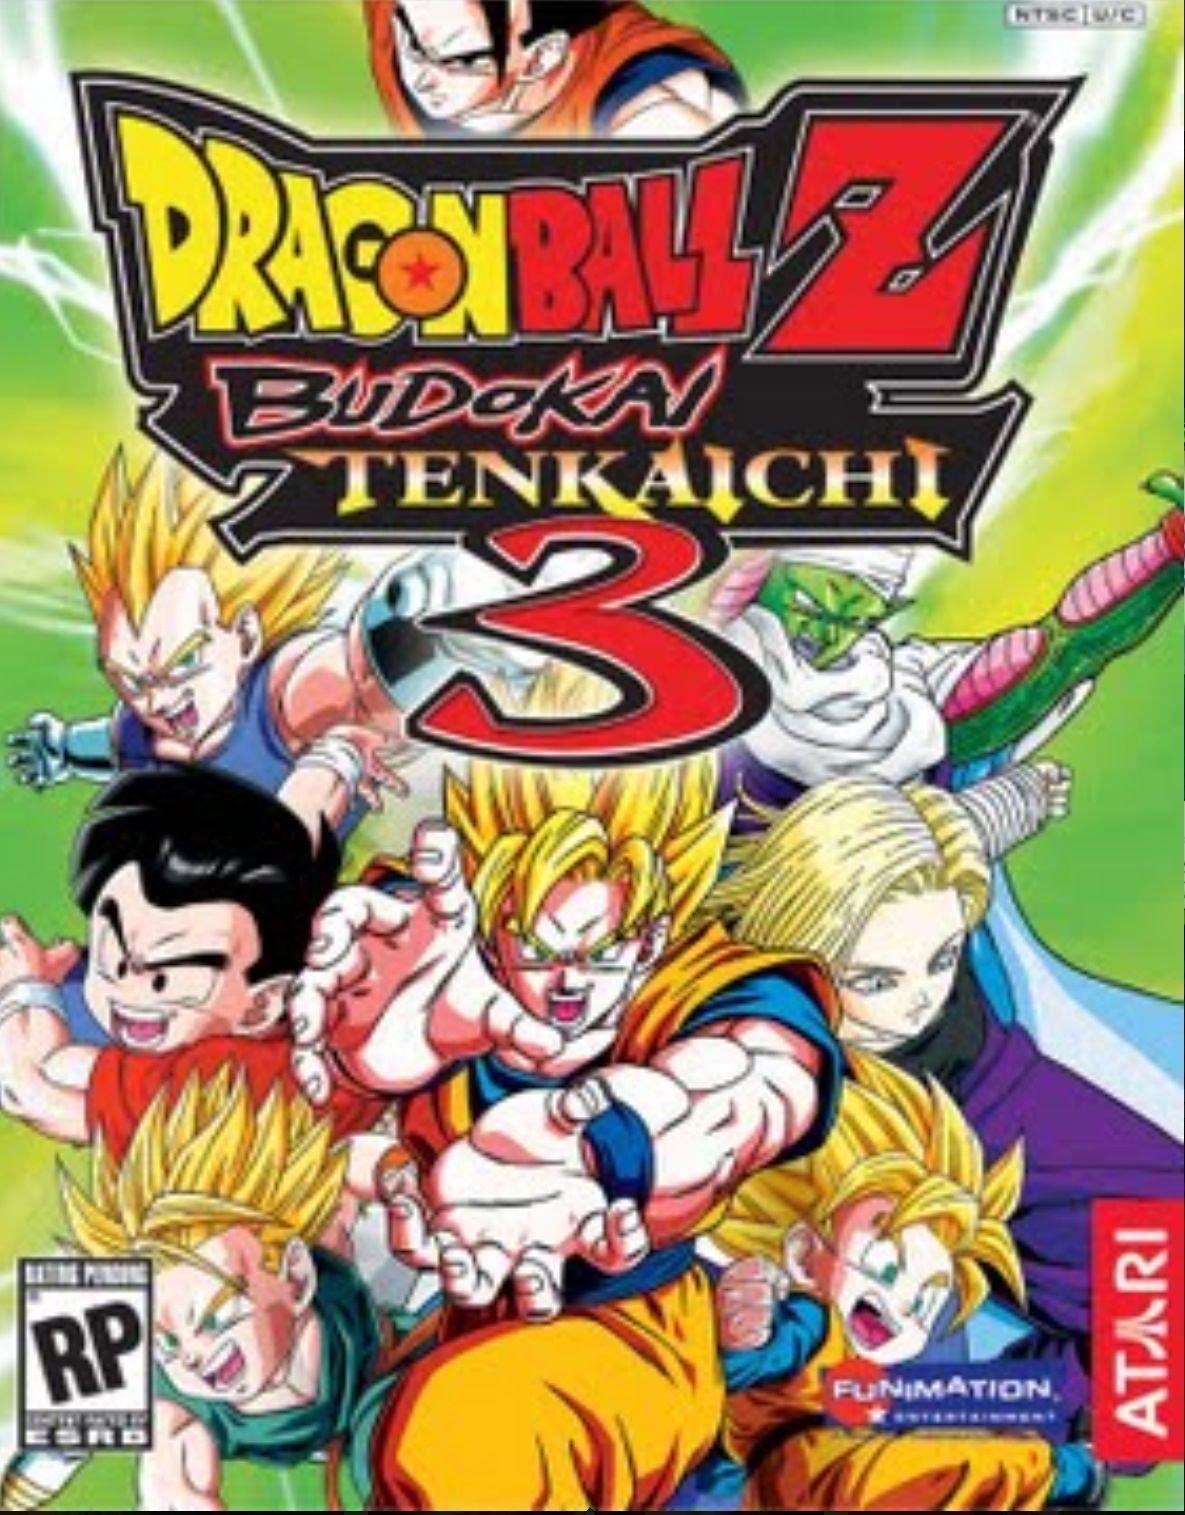 Dragon Ball Z budoki tenkaichi 3!!! Dragon ball z, Wii games